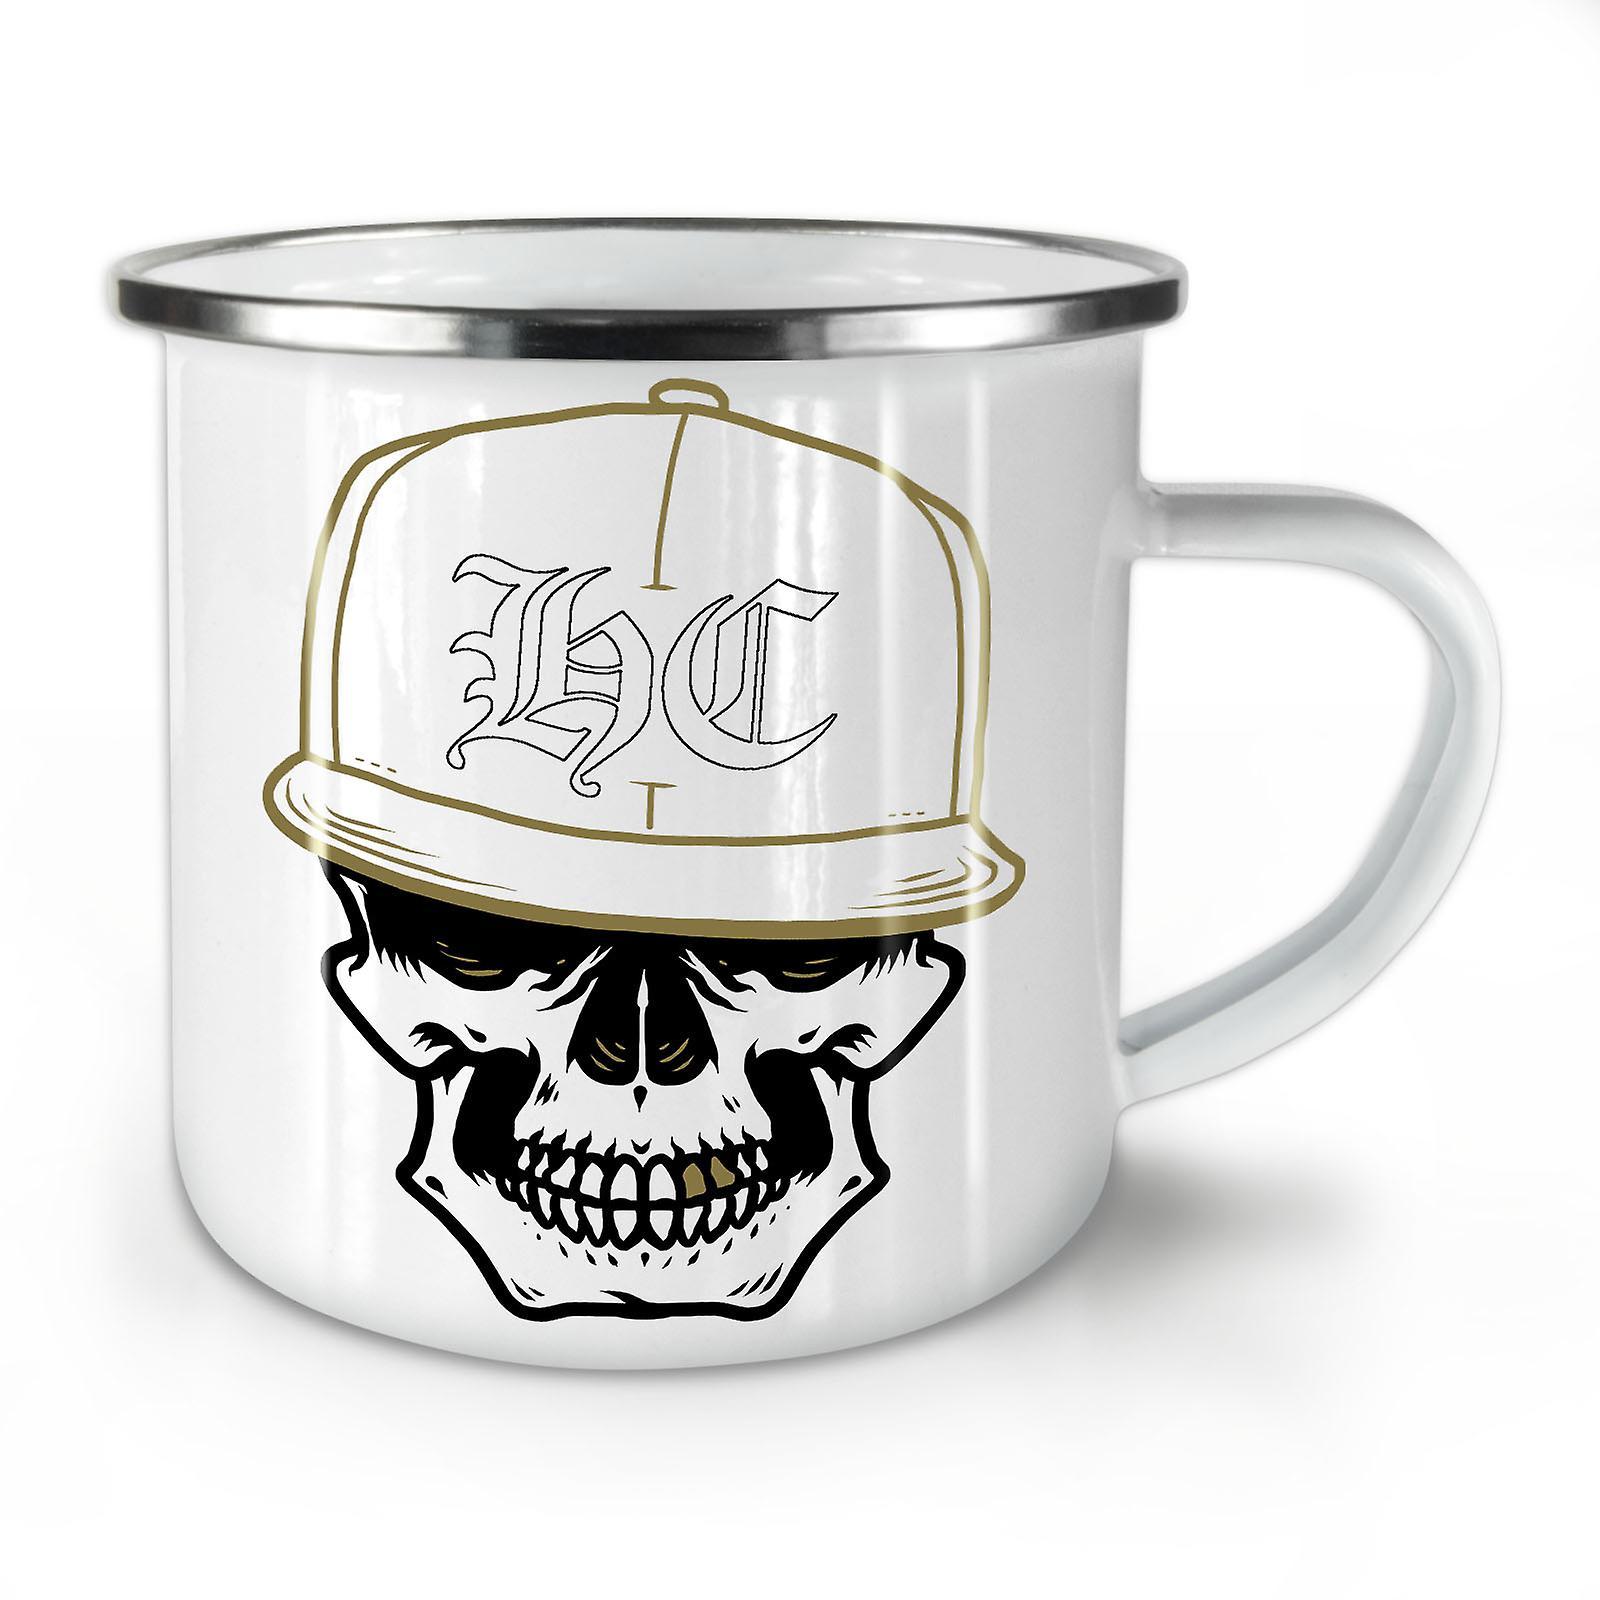 Enamel Coffee Skull Mug10 Gamer OzWellcoda New Whitetea Swag 0knOPw